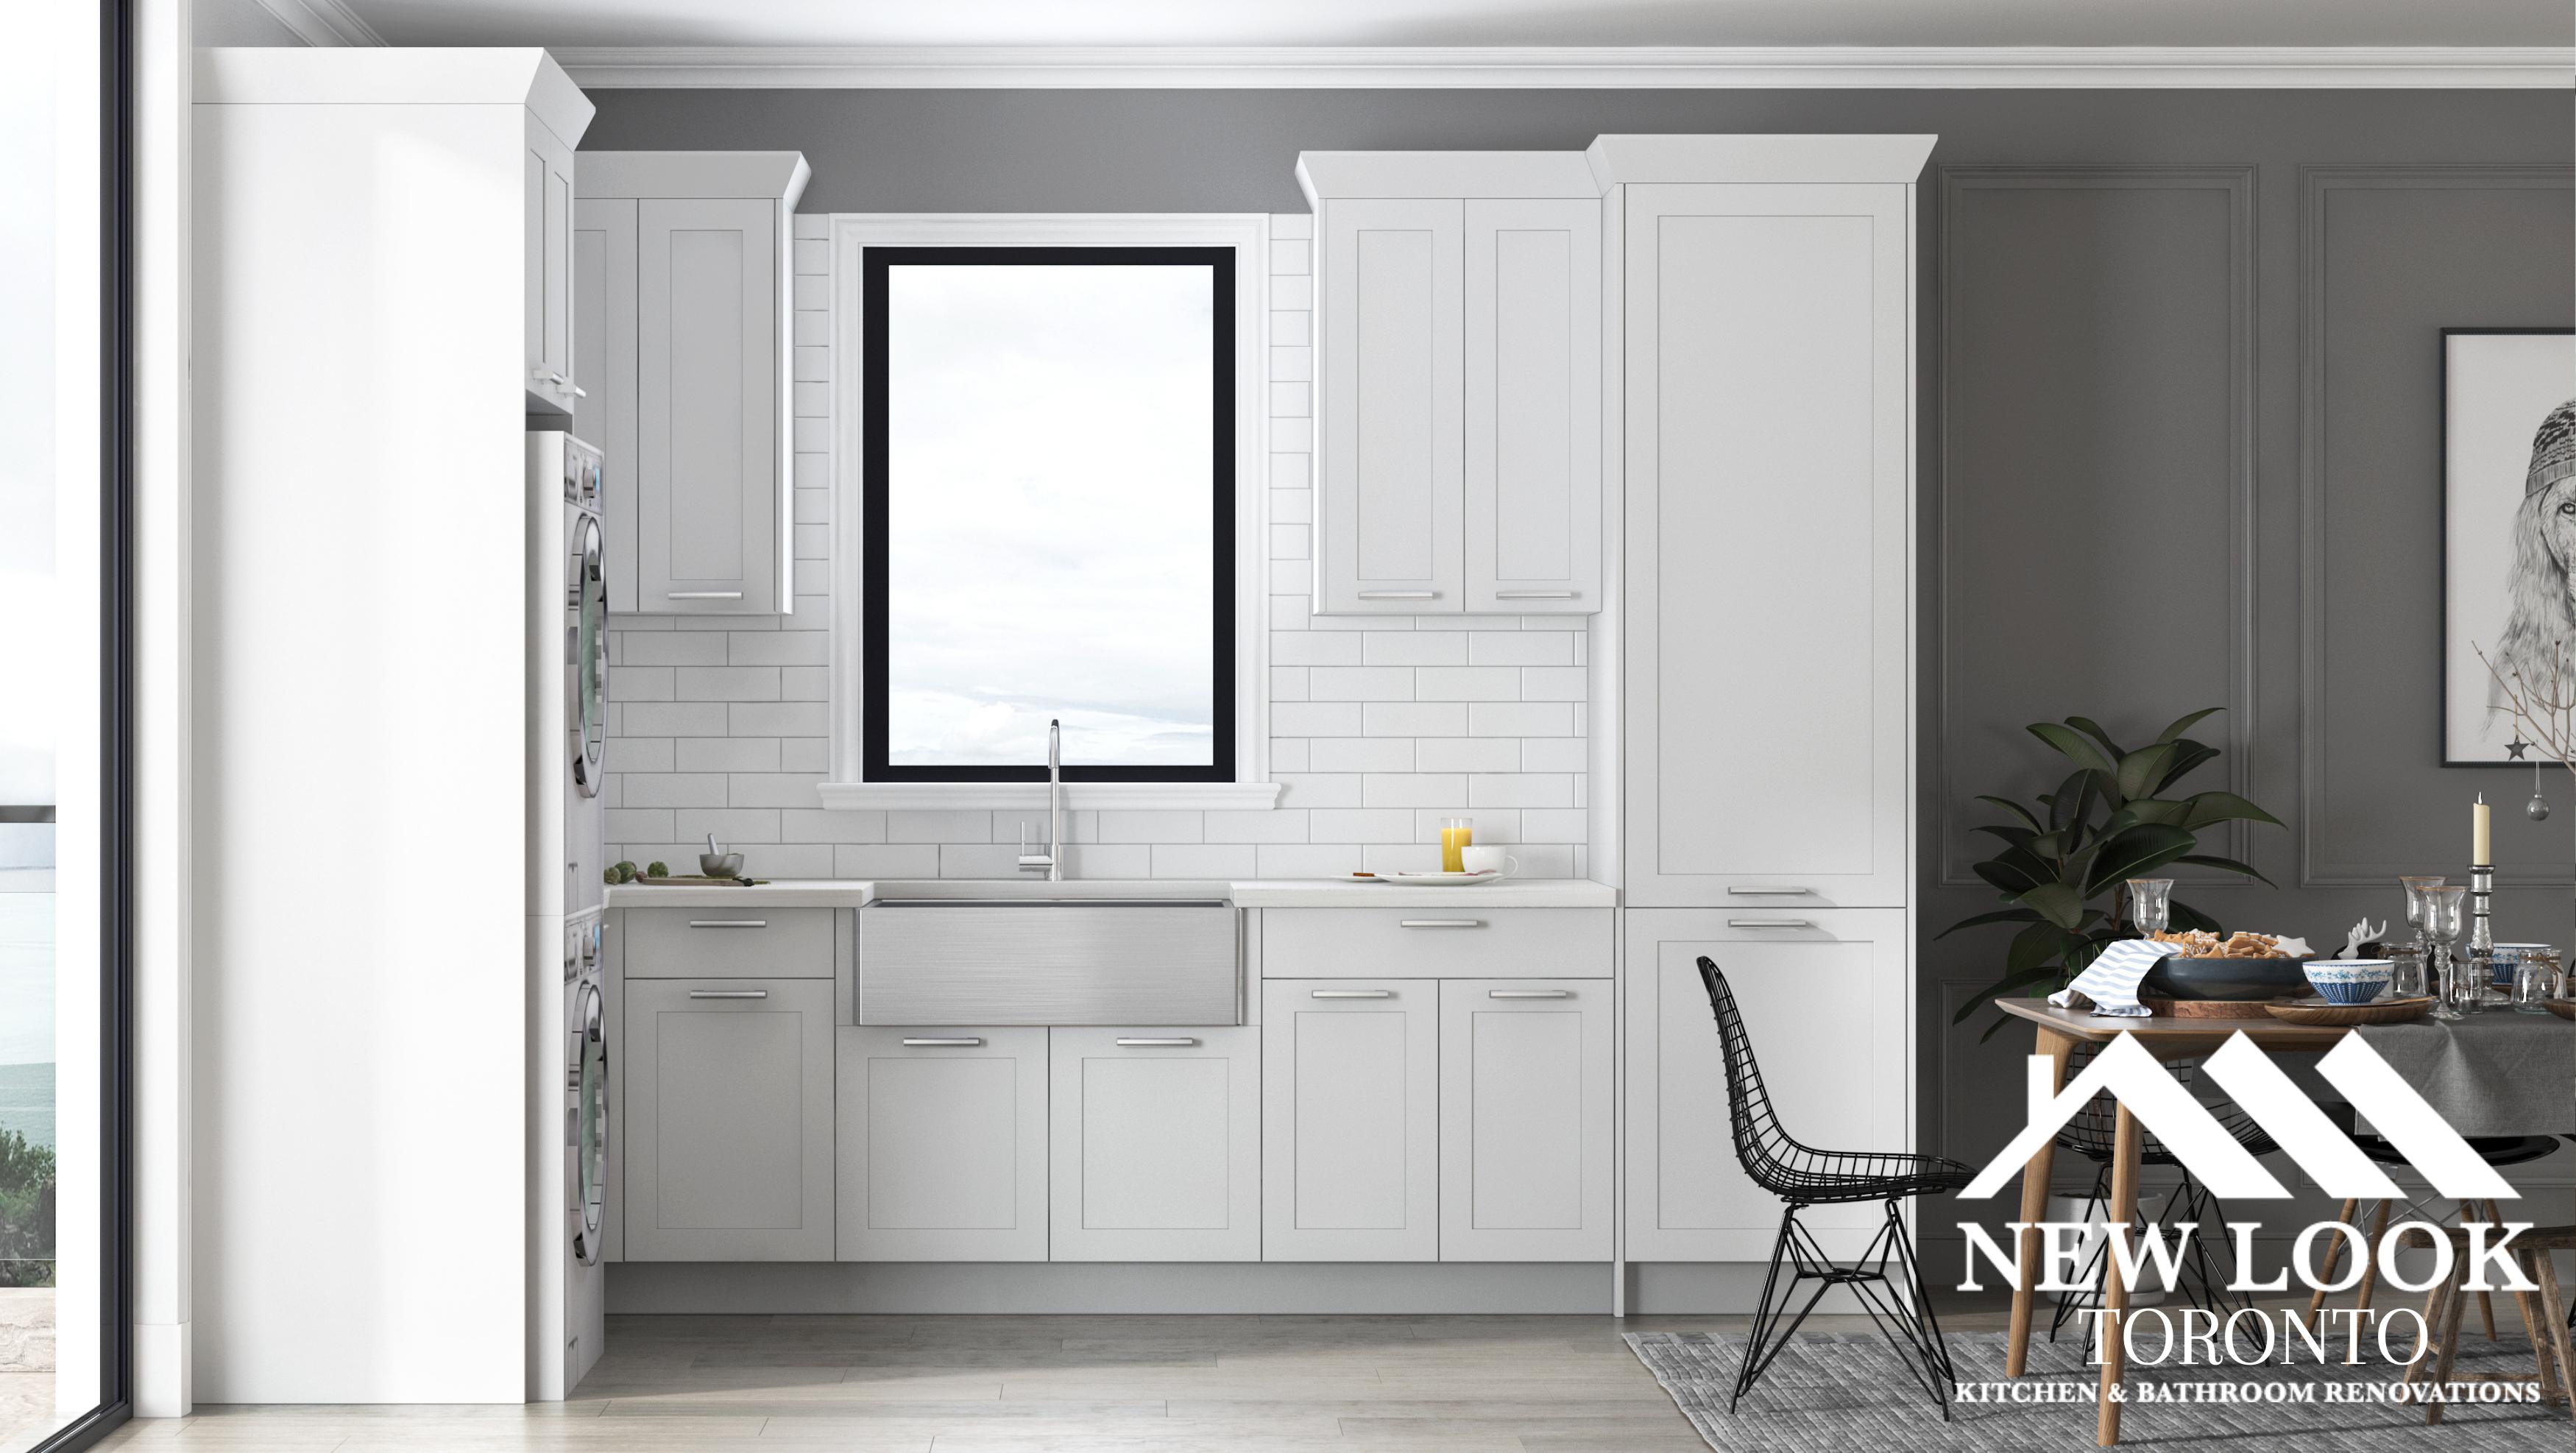 Sink under cabinet in New Look Toronto Kitchen & Bathroom Renovation